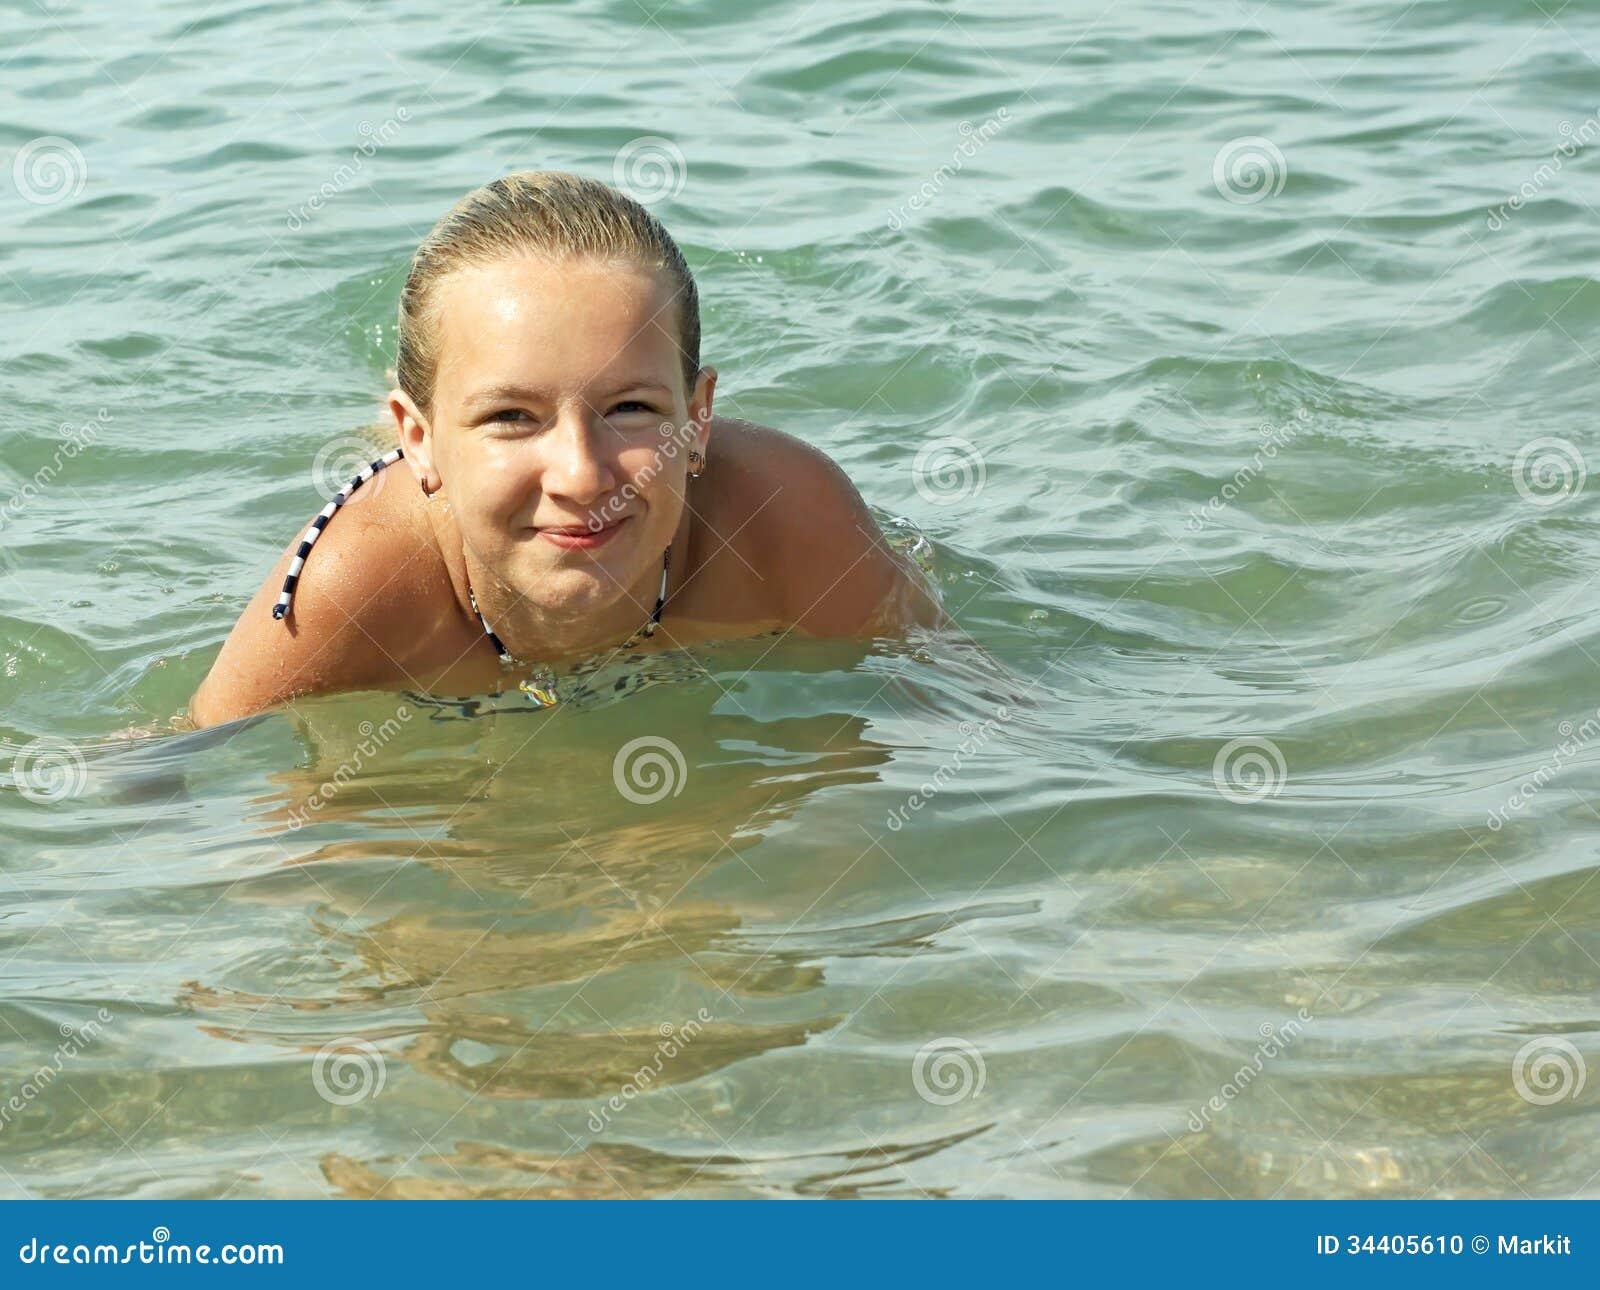 teenage girl swimming in seawater stock photo - image of bottom